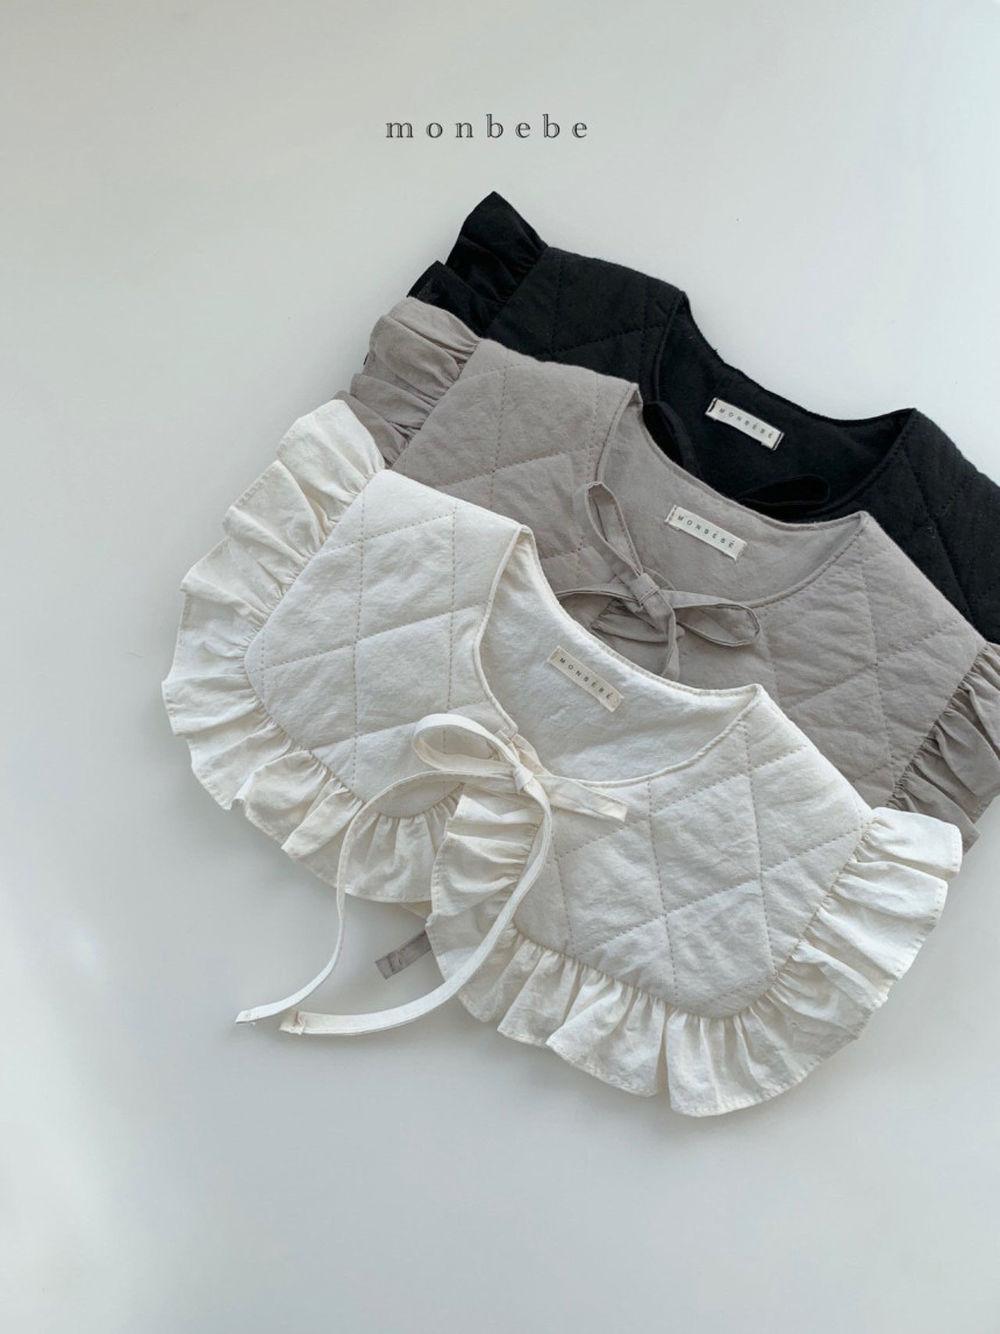 MONBEBE - Korean Children Fashion - #Kfashion4kids - Coco Cape Collar with Mom